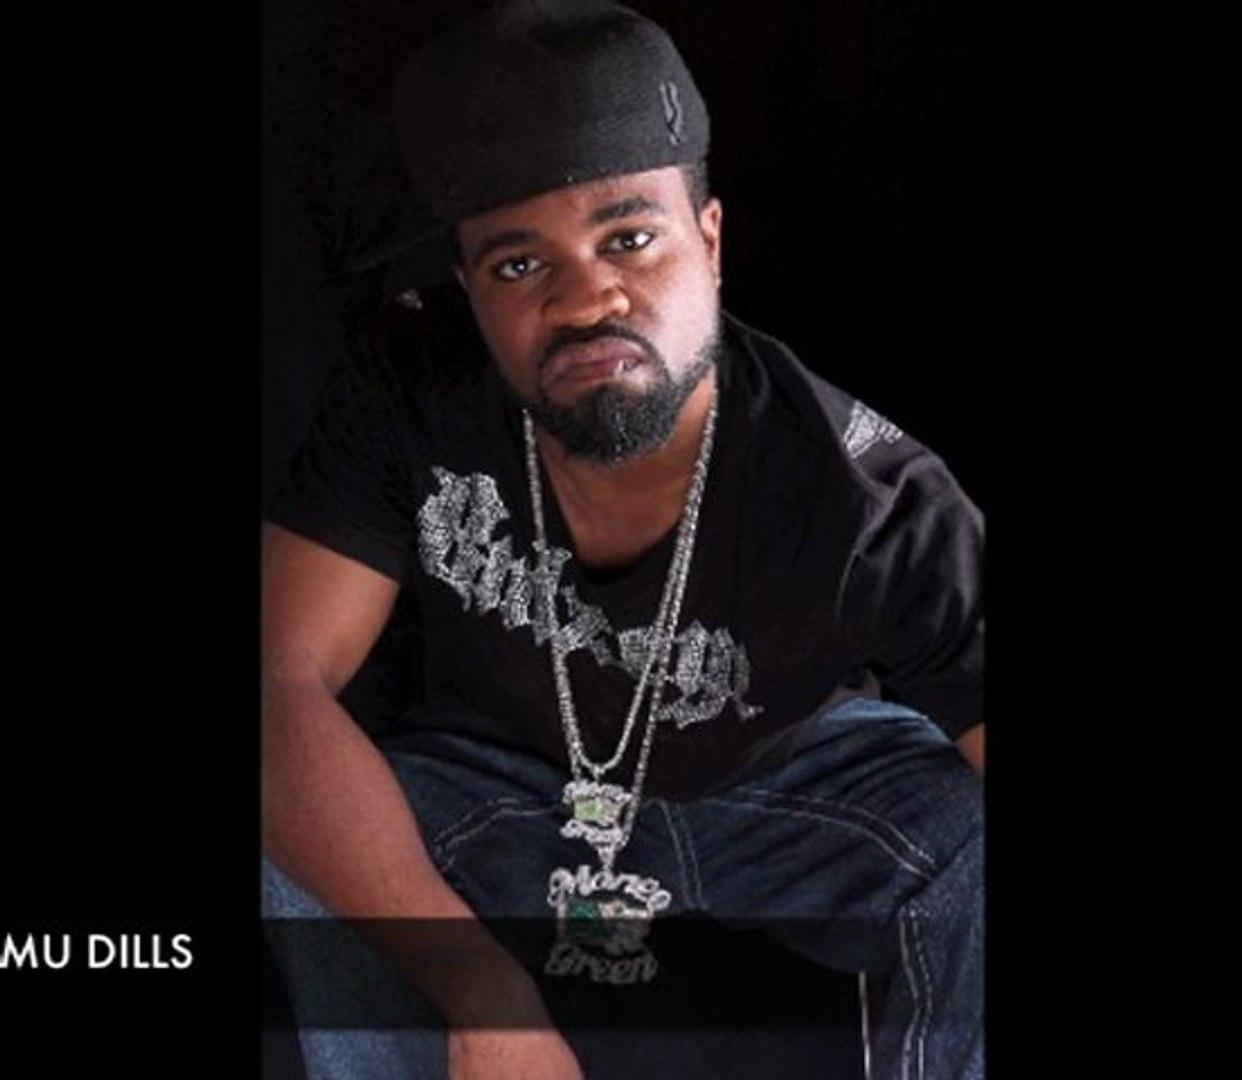 MU DILLS - If I Die Today Part 2 (Lil Wayne rick ross )